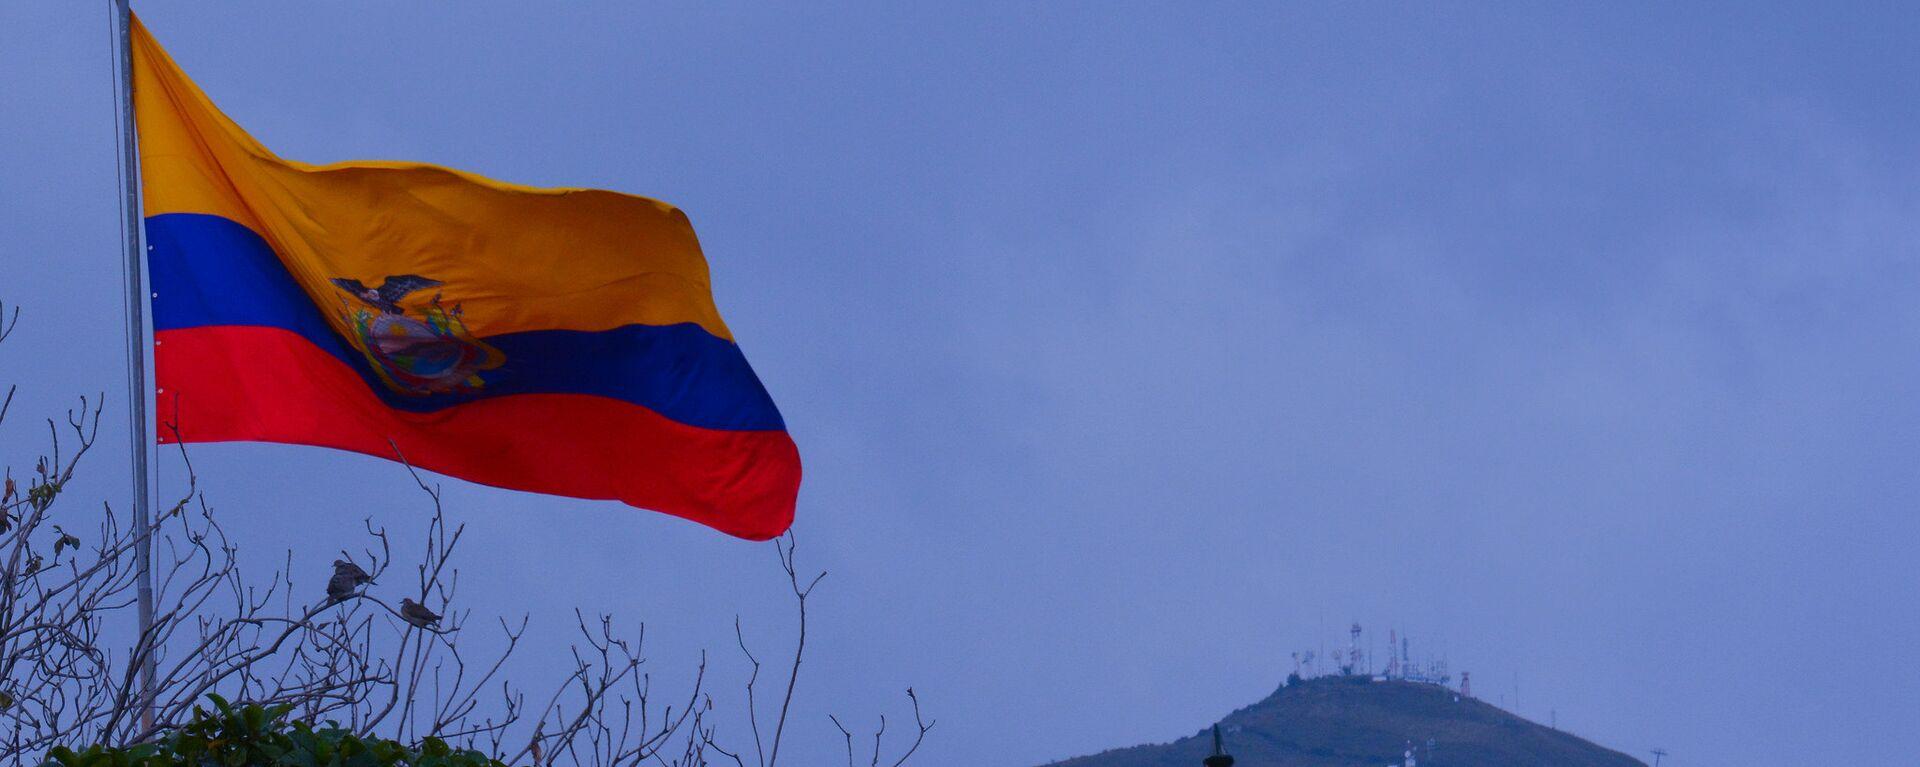 La bandera de Ecuador - Sputnik Mundo, 1920, 23.07.2019